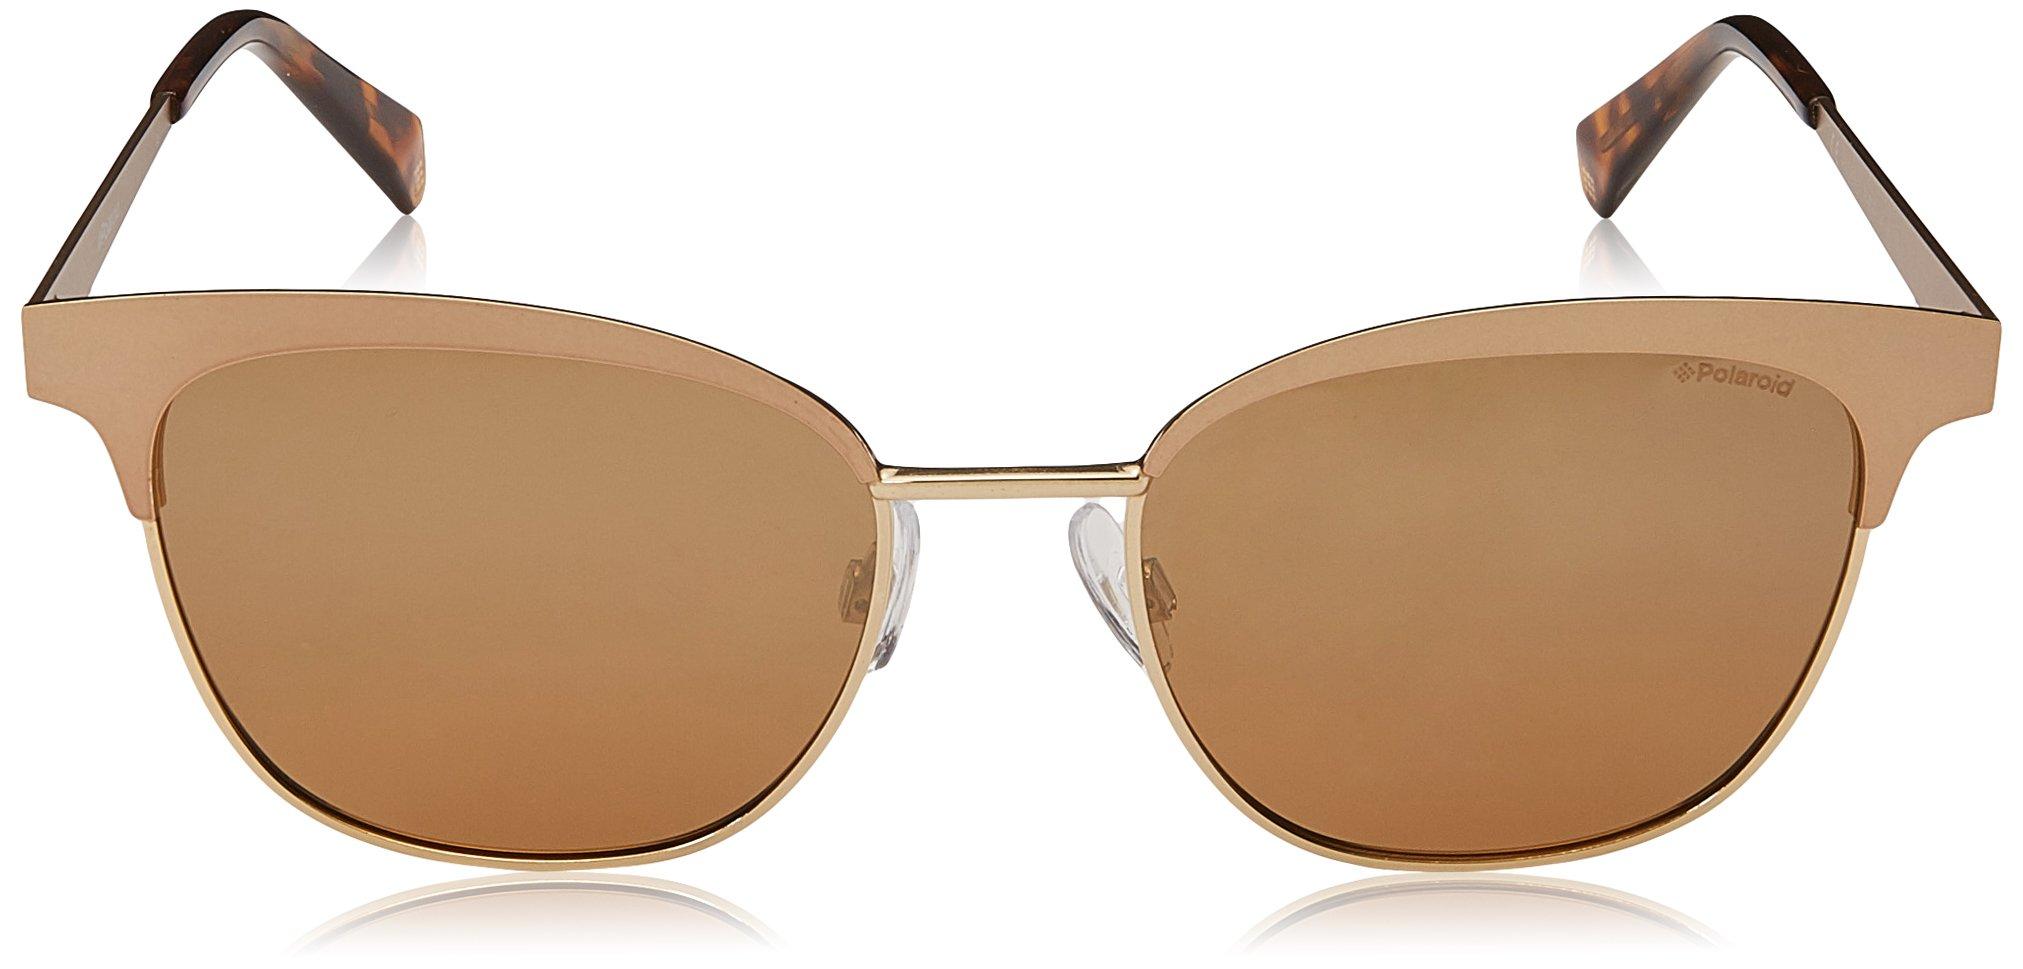 Polaroid PLD 4055/S QD AOZ 54 Gafas de sol, Dorado (Semtt Gold/Grey Grey), Mujer